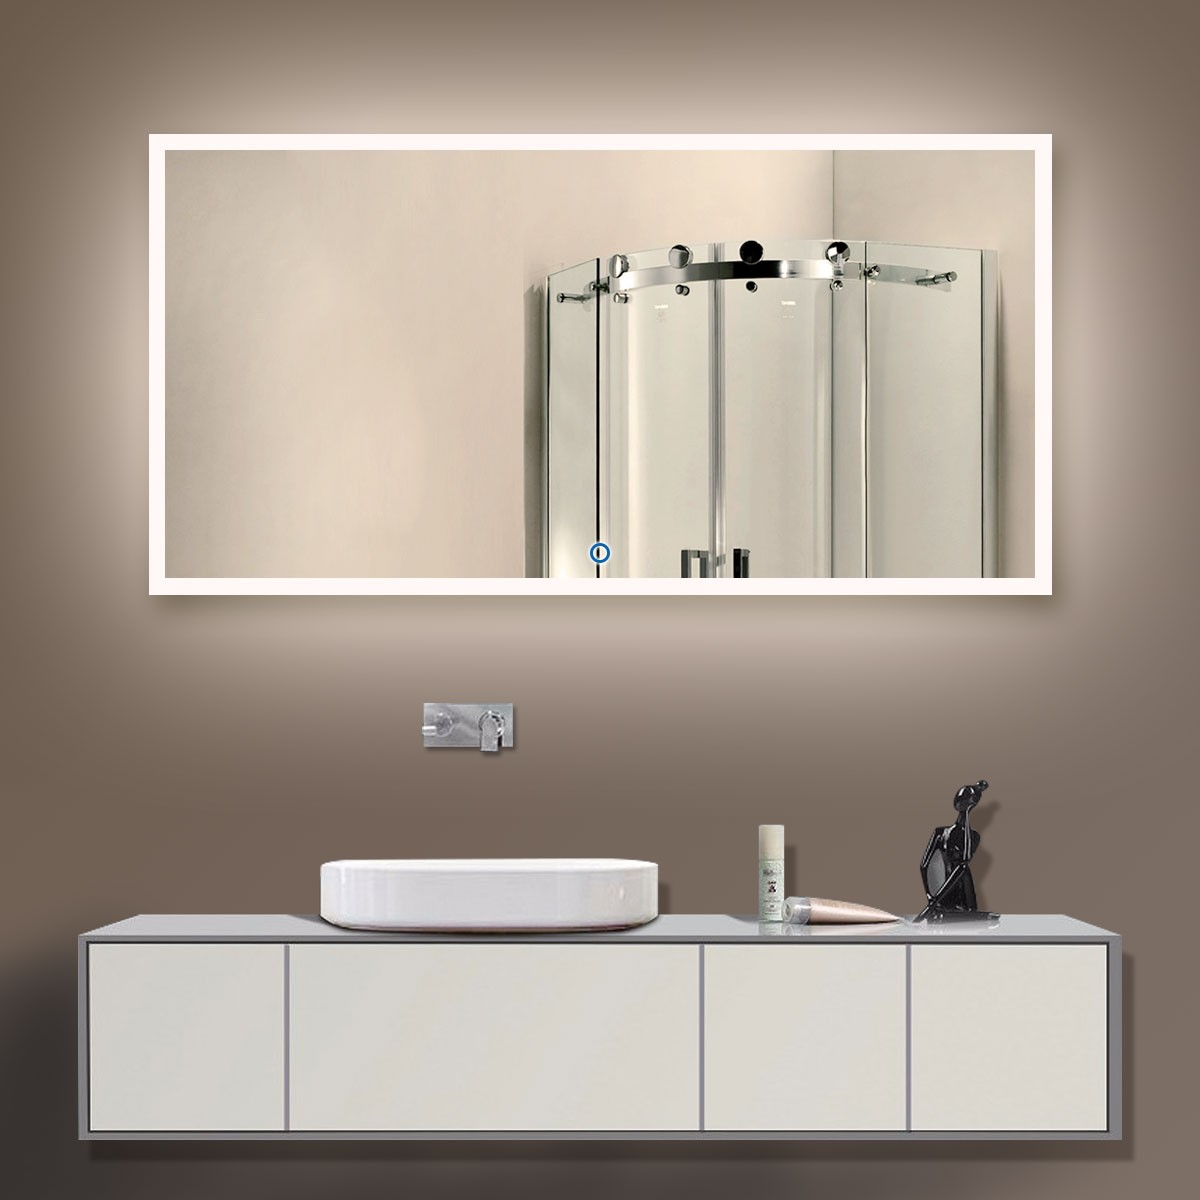 Lovely Illuminated Bathroom Vanity Mirror